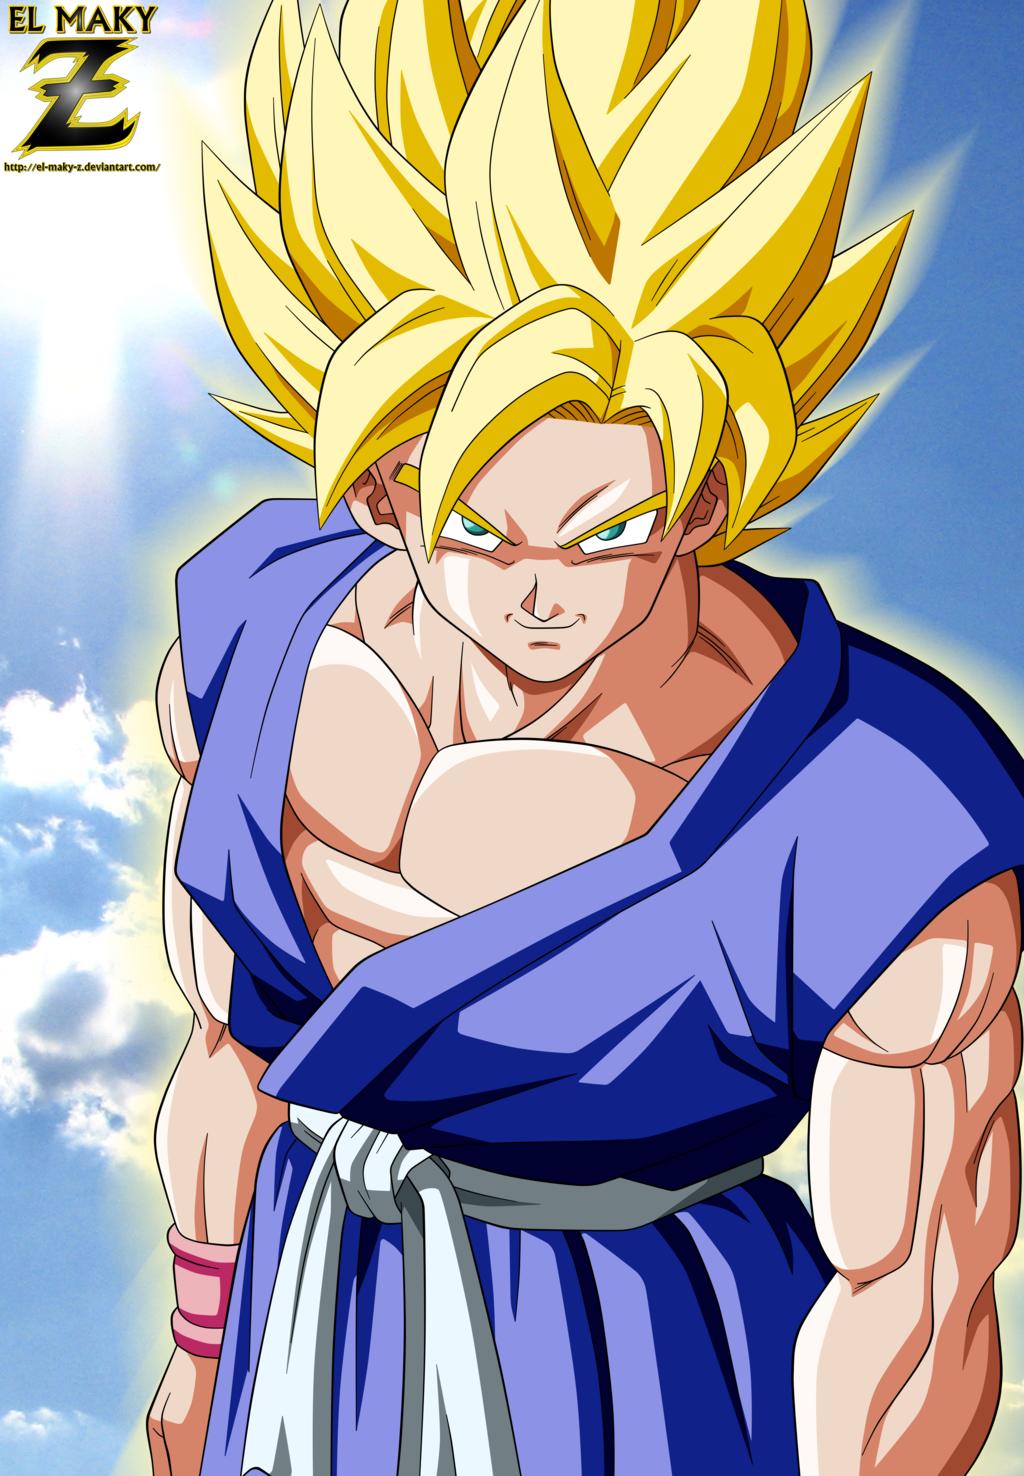 Best 25 super saiyan goku ideas on pinterest dbz super - Super saiyan 6 goku pictures ...